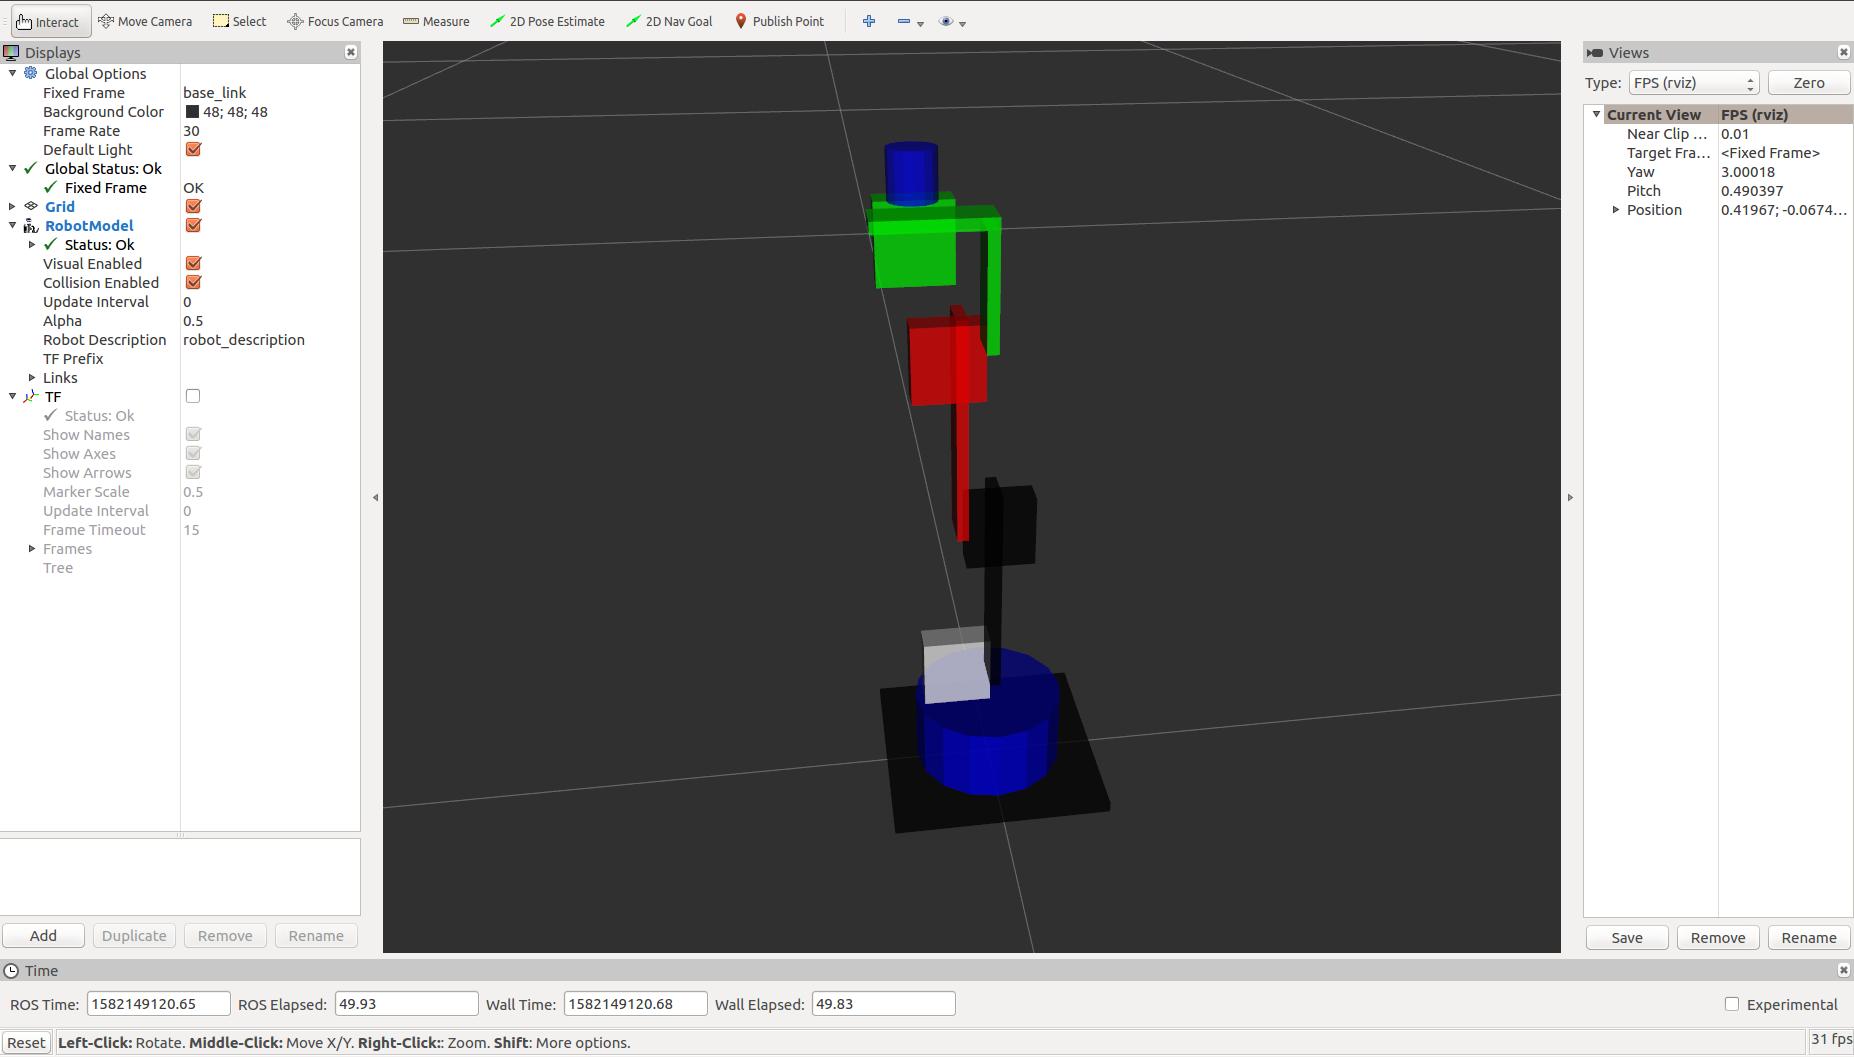 Robotic_Arm_AK_MP_image4.png